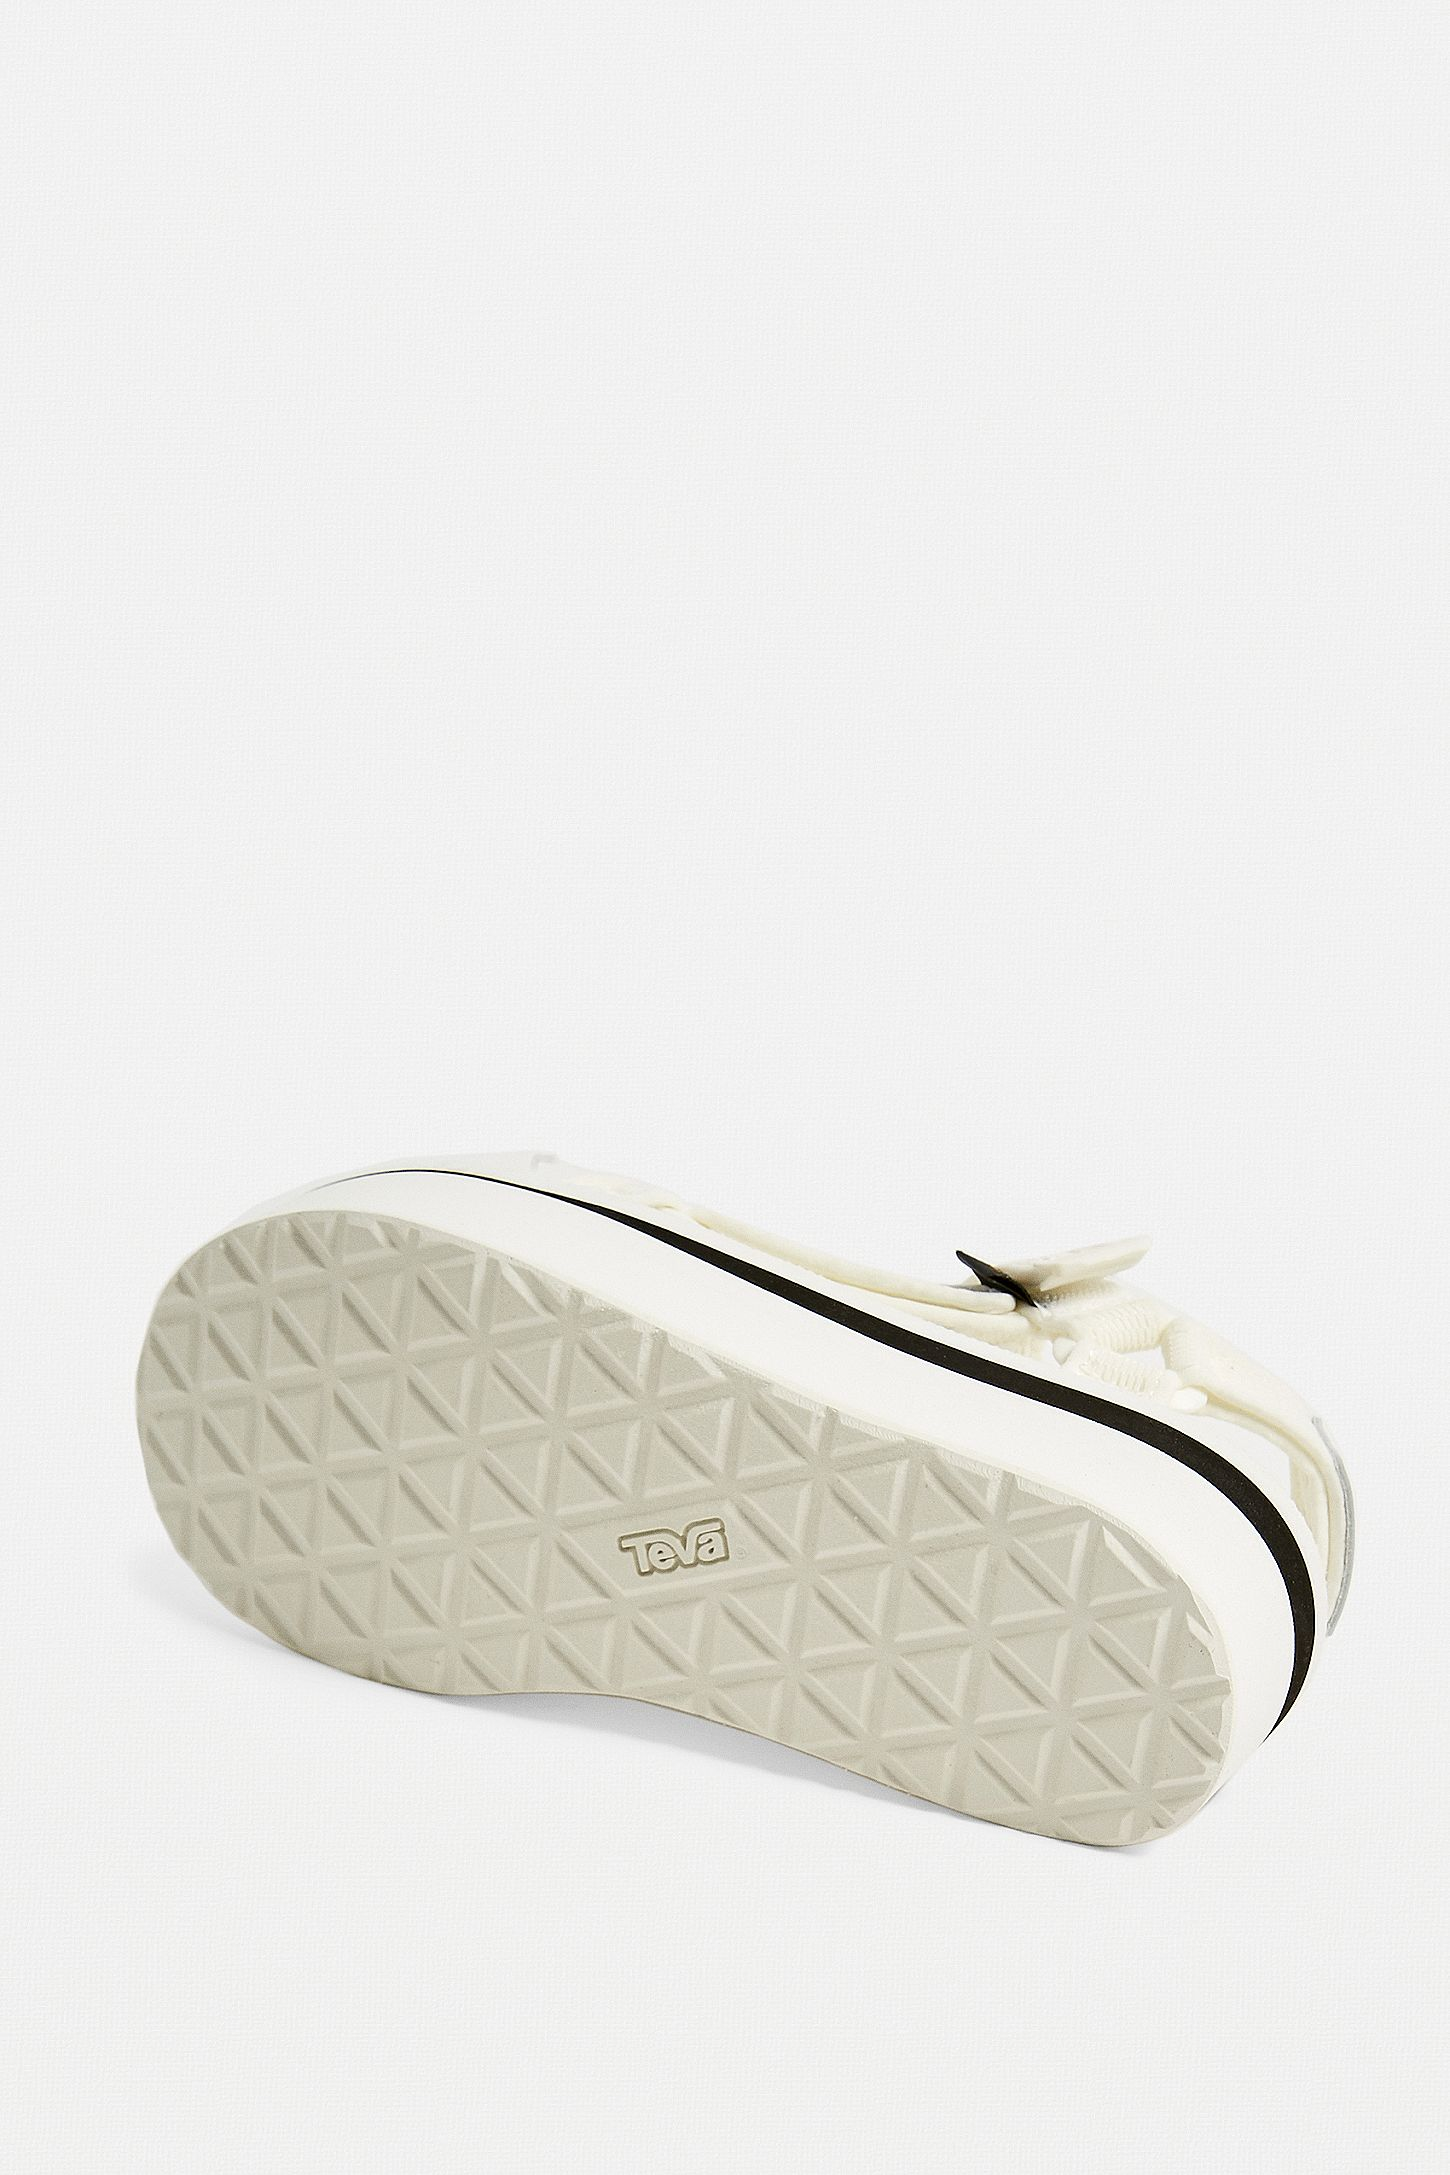 d854a41f48de Slide View  5  Teva Universal White Mesh Flatform Sandals